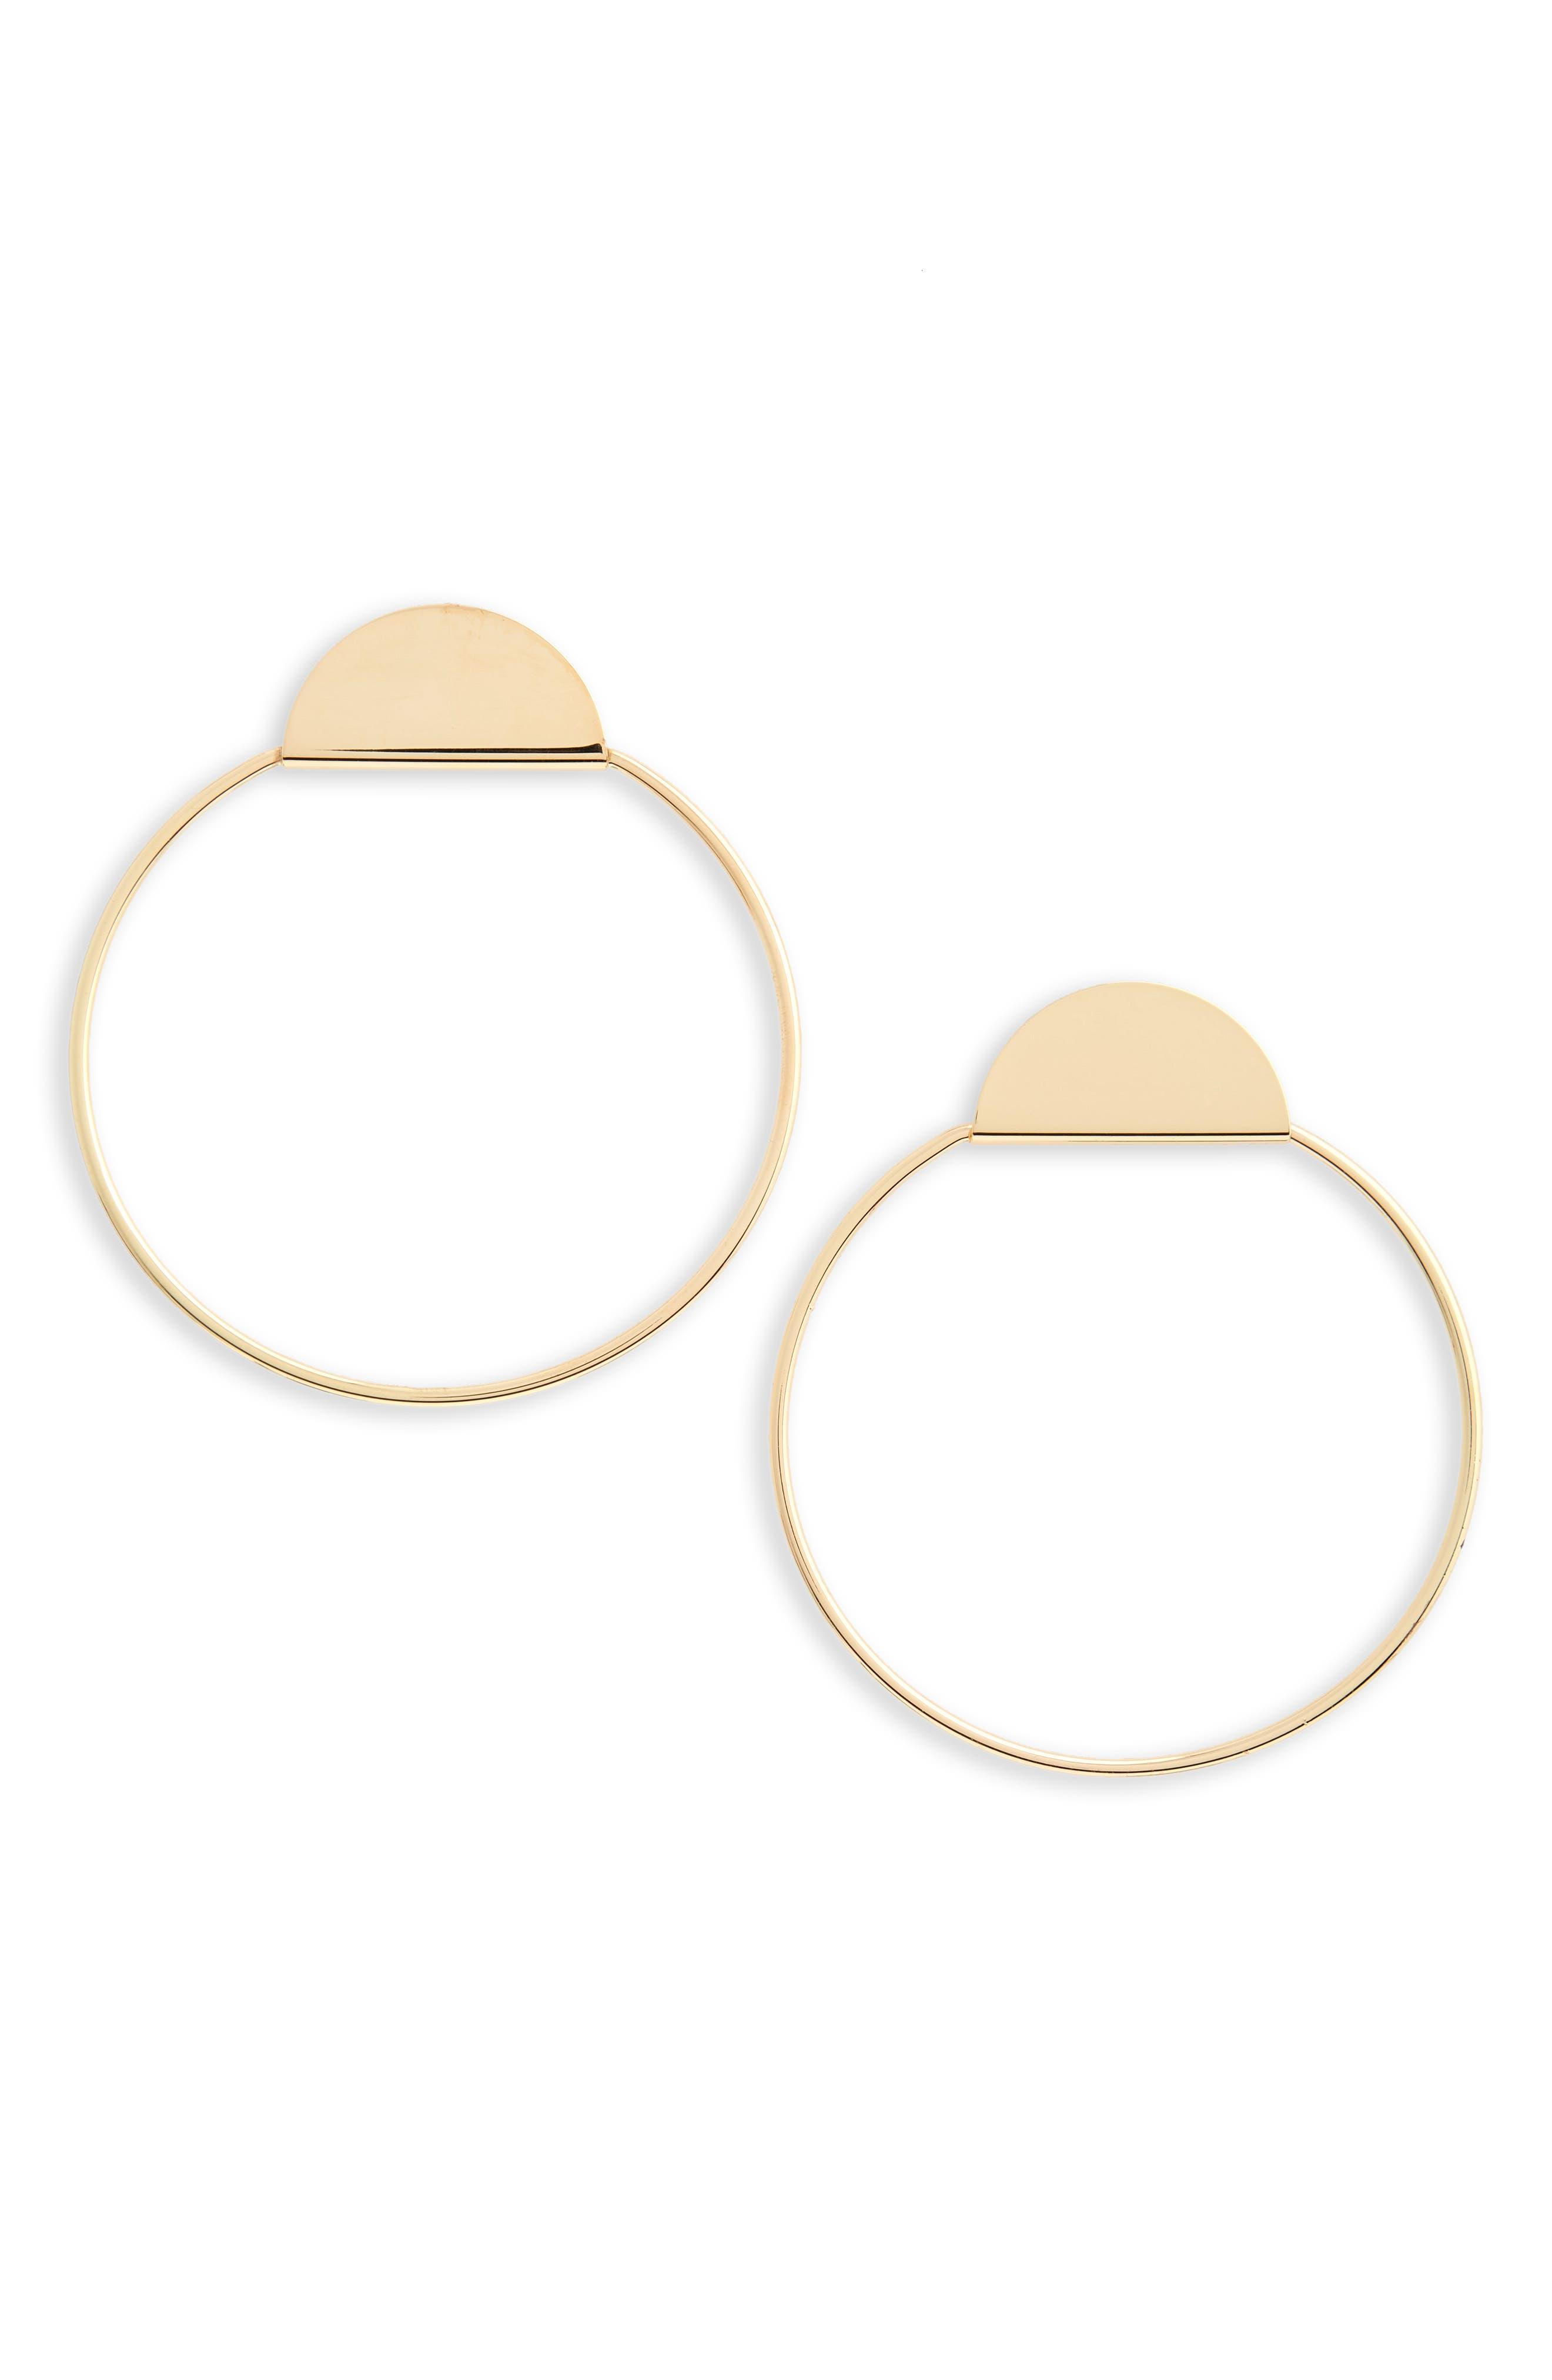 Half-Circle & Hoop Earrings,                         Main,                         color, Gold